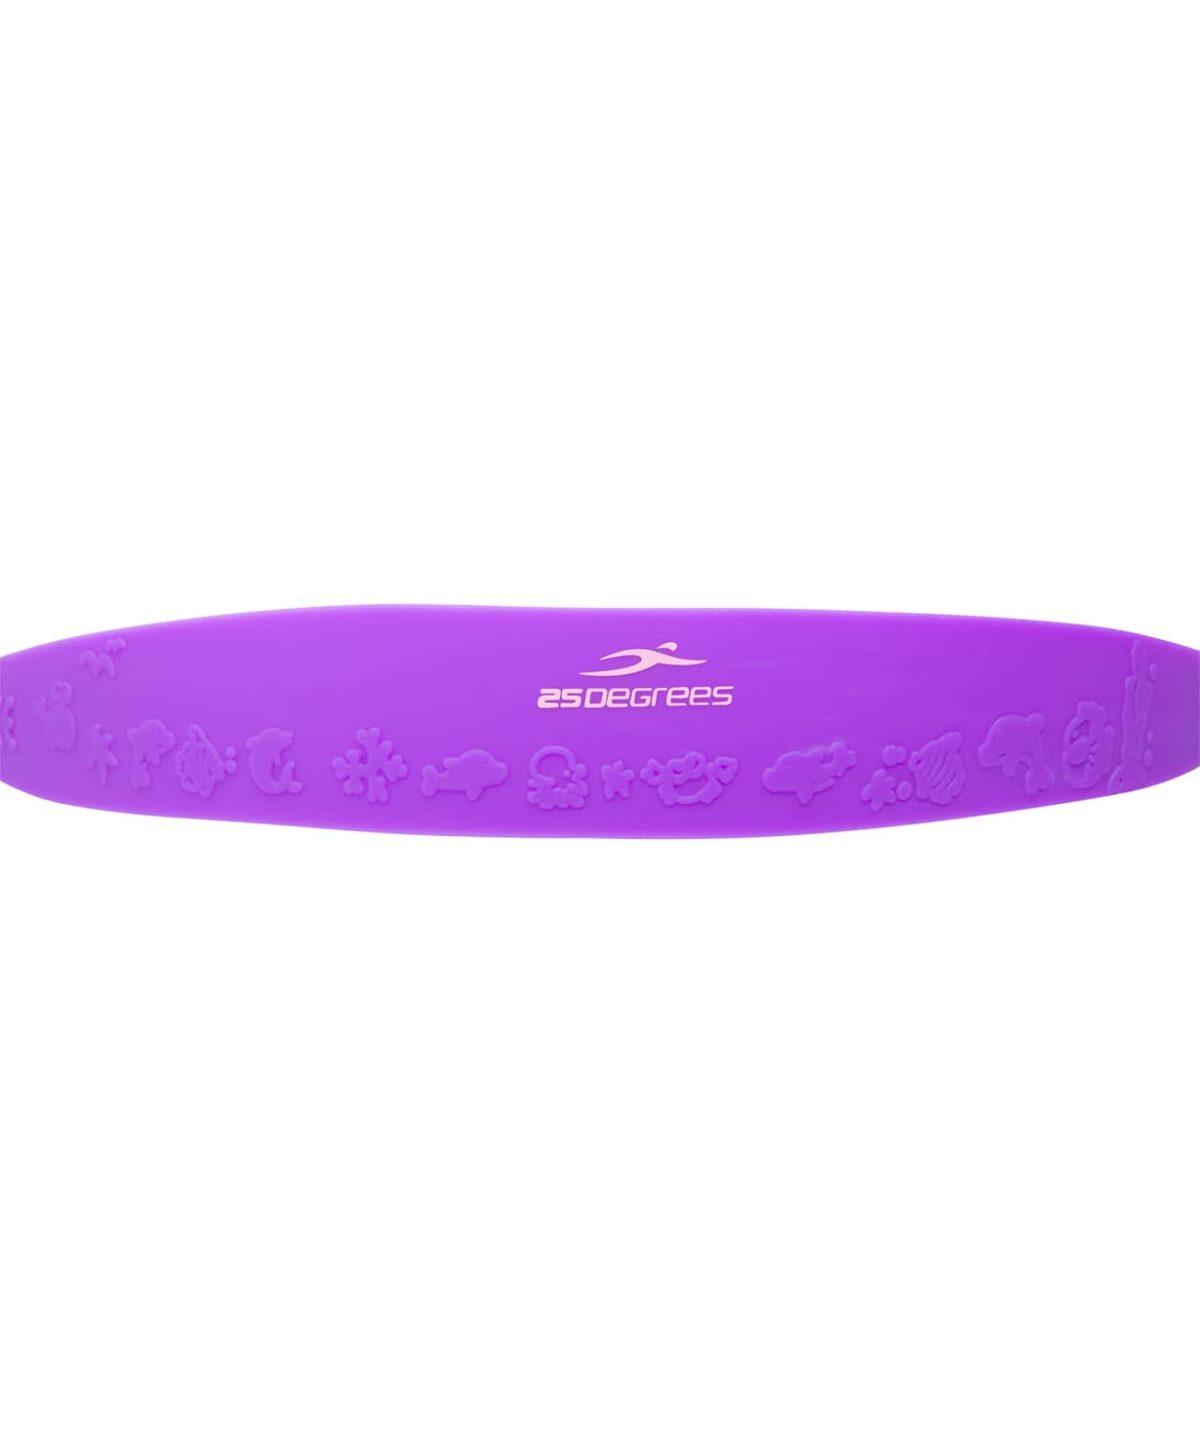 25DEGREES Flappy Pink/Purple Очки для плавания детские  17337 - 3